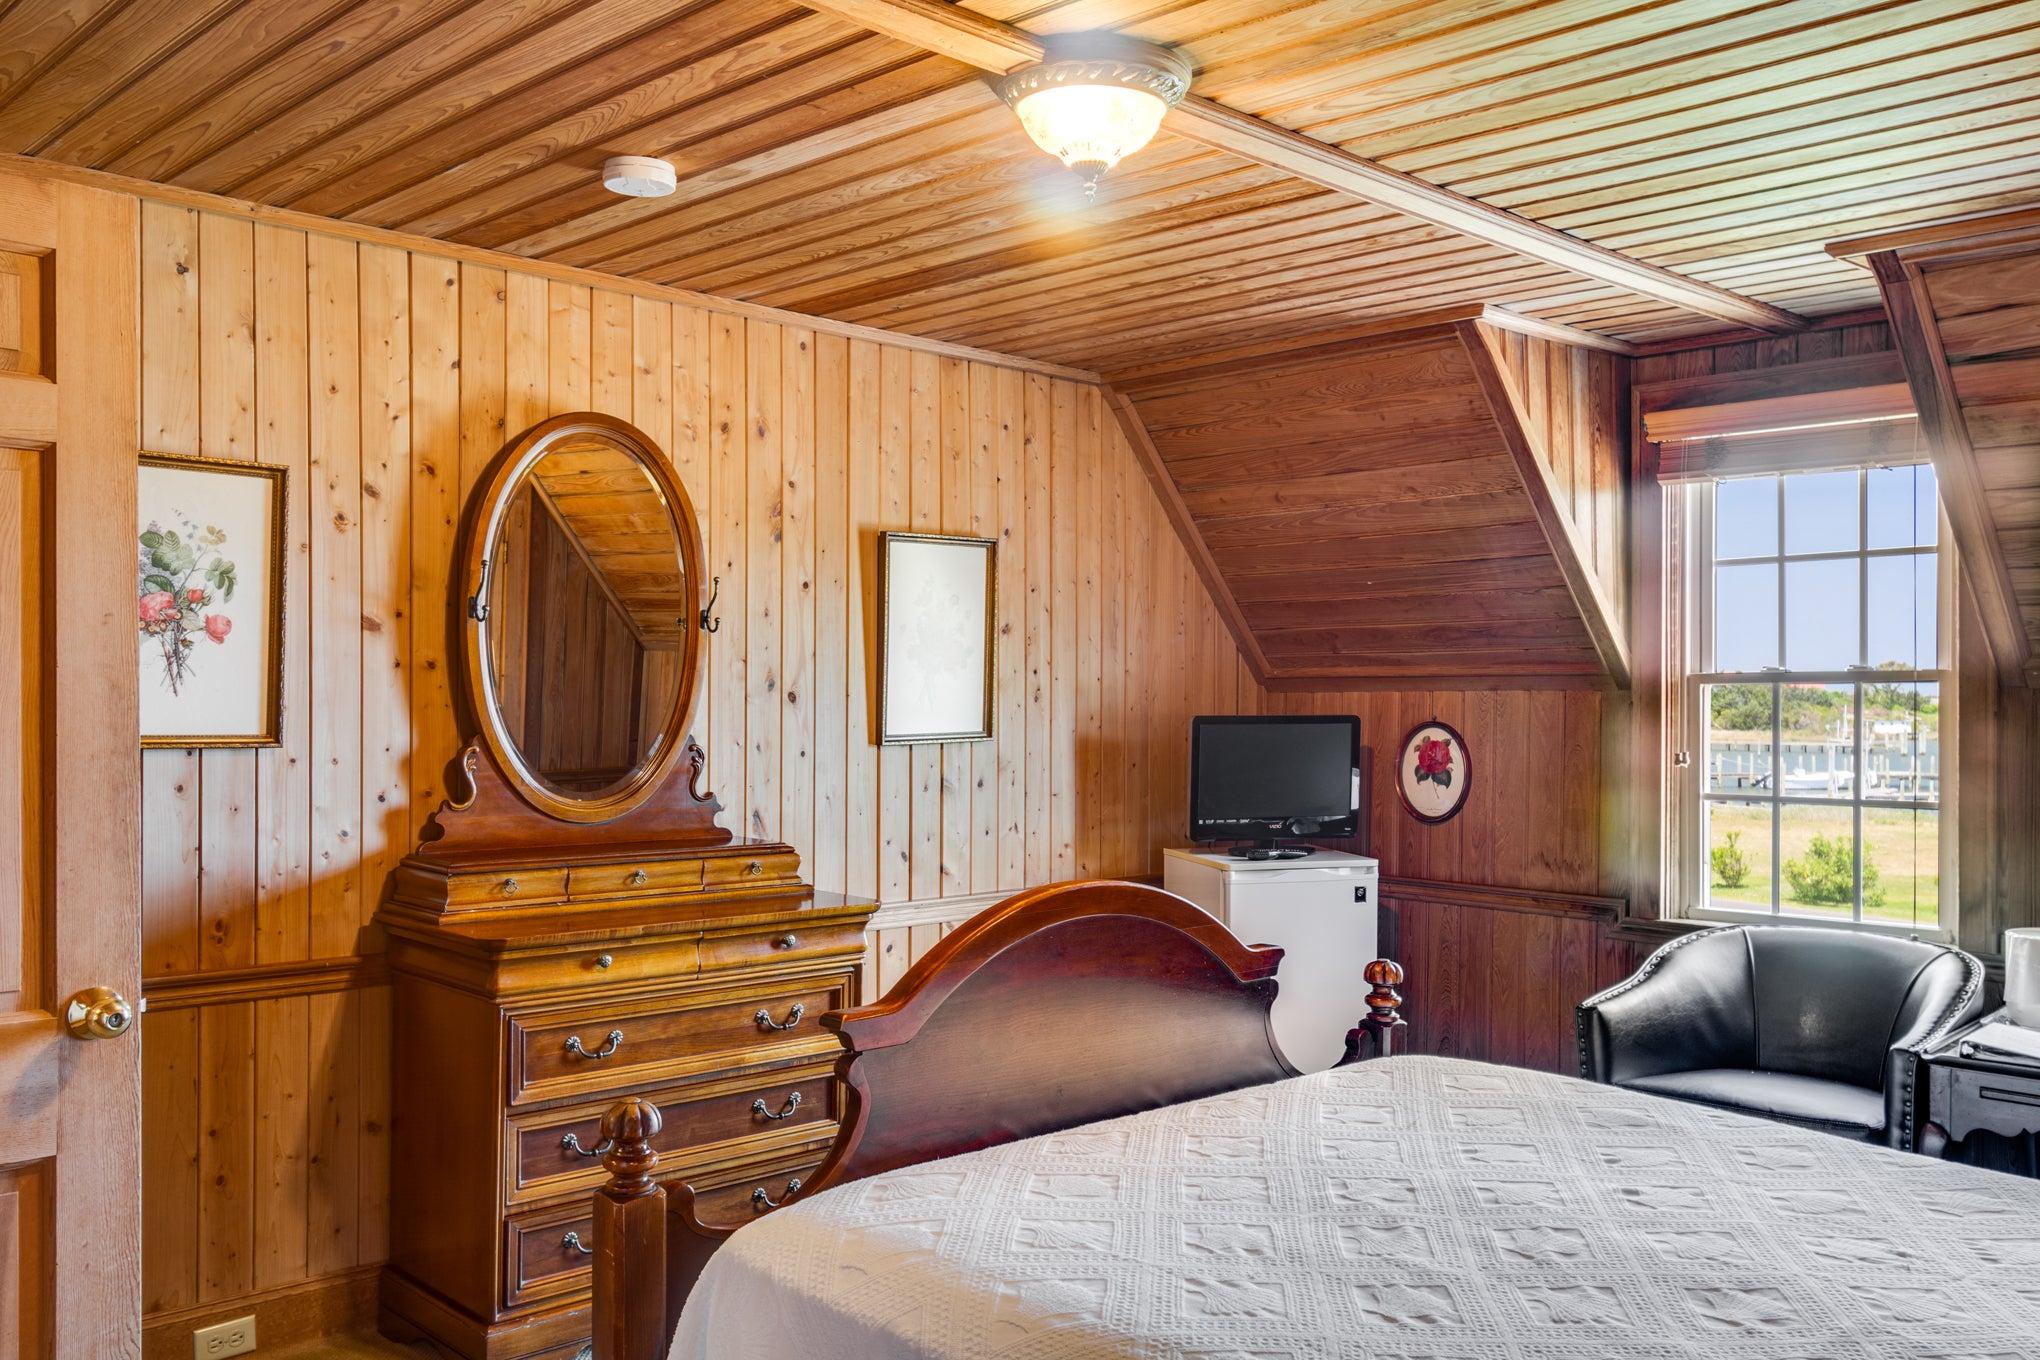 Katies-Room